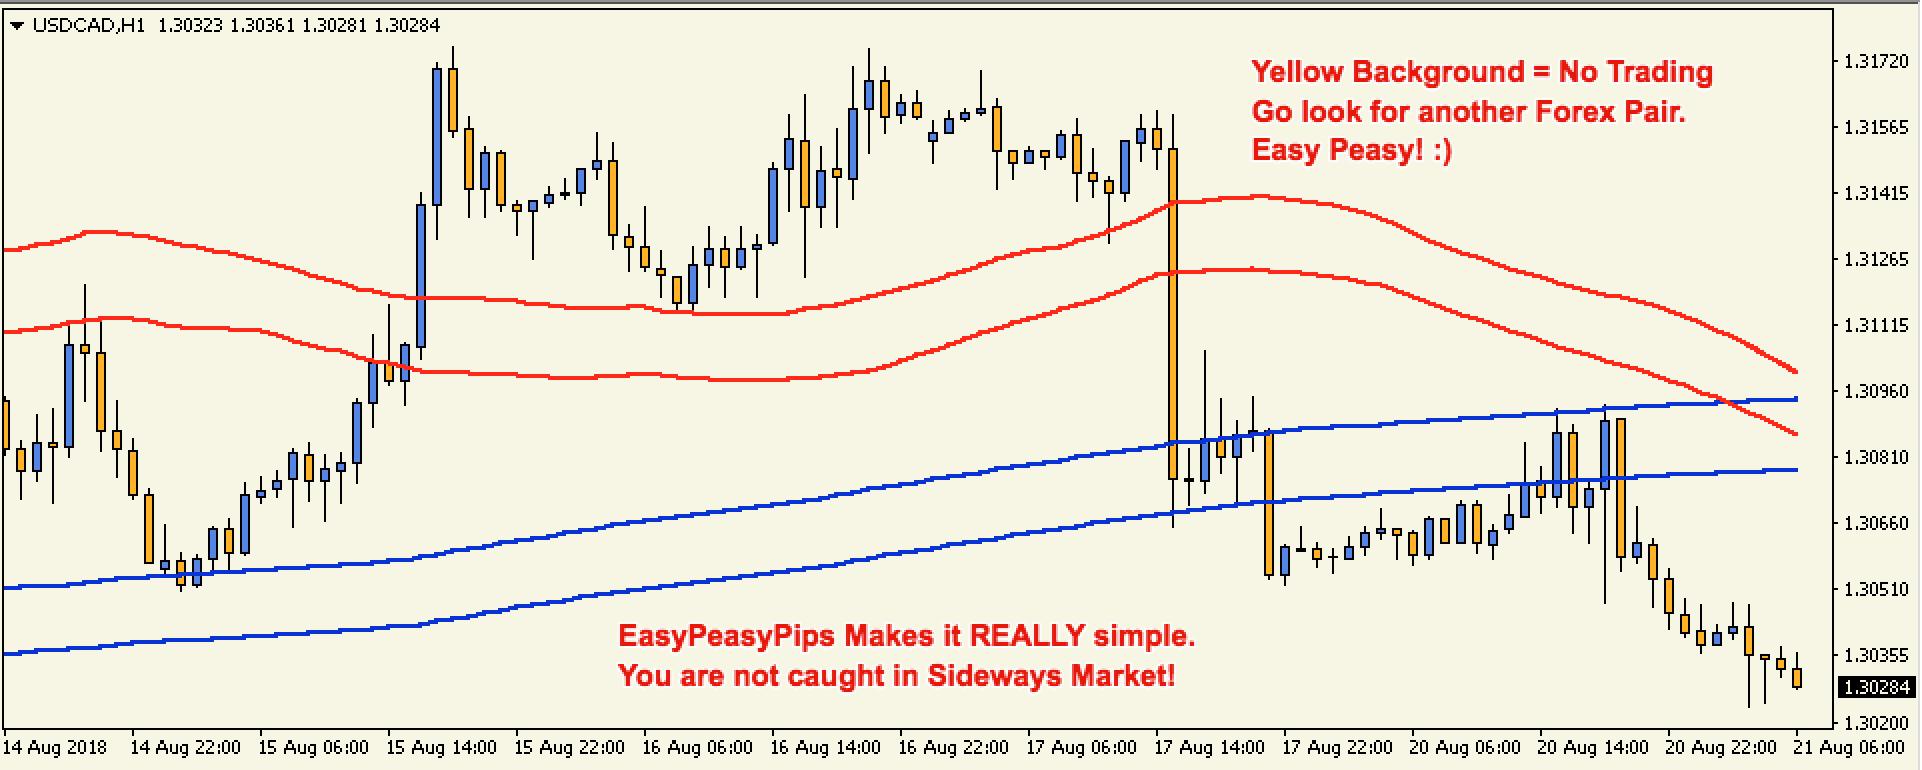 EasyPeasyPips - Keeps You Away from Sideway Markets